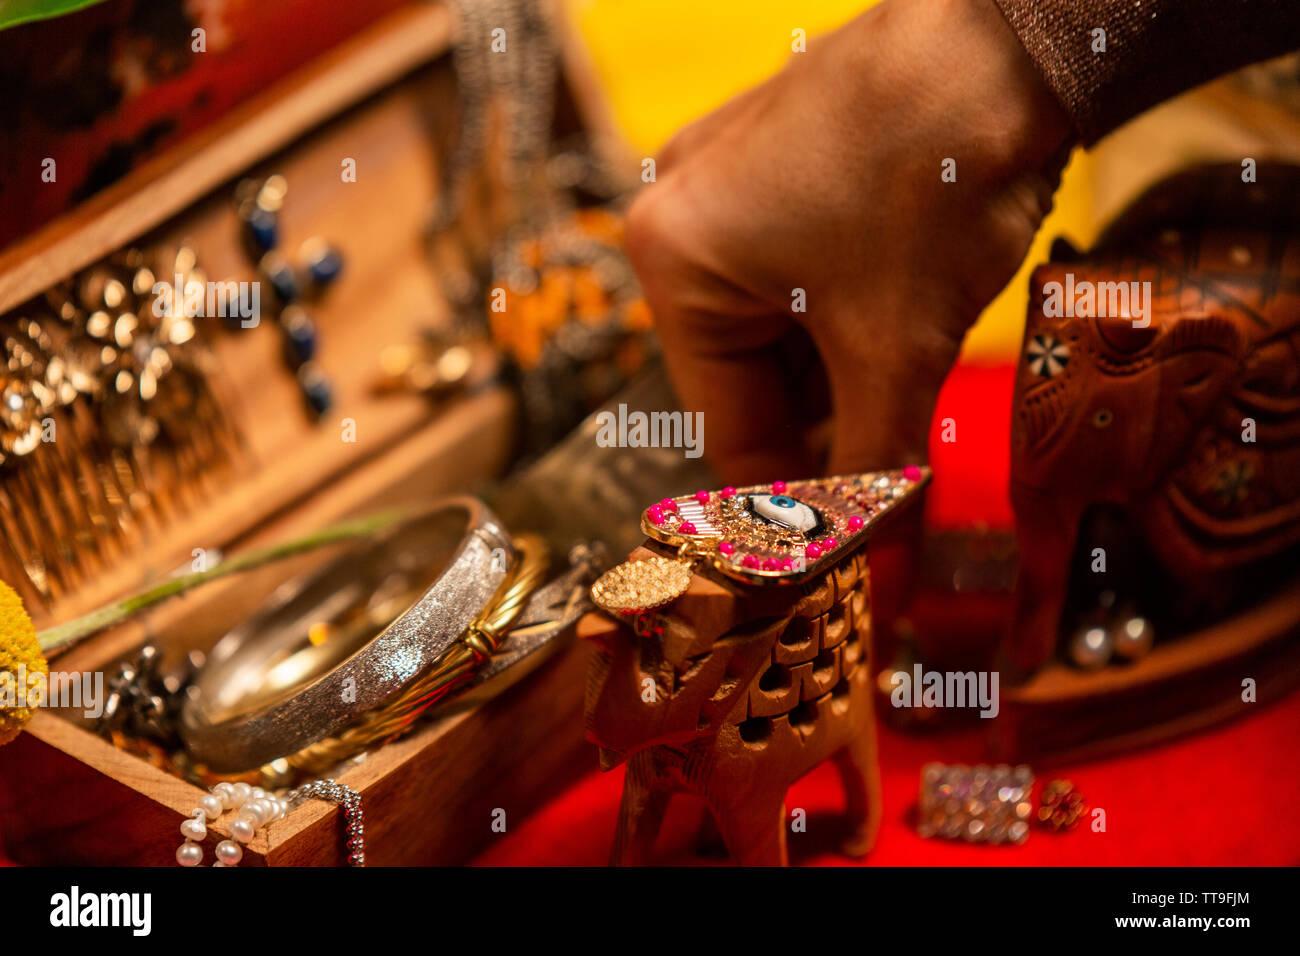 7/8 Hand decorationg Tabelle mit Schmuck Stockfoto